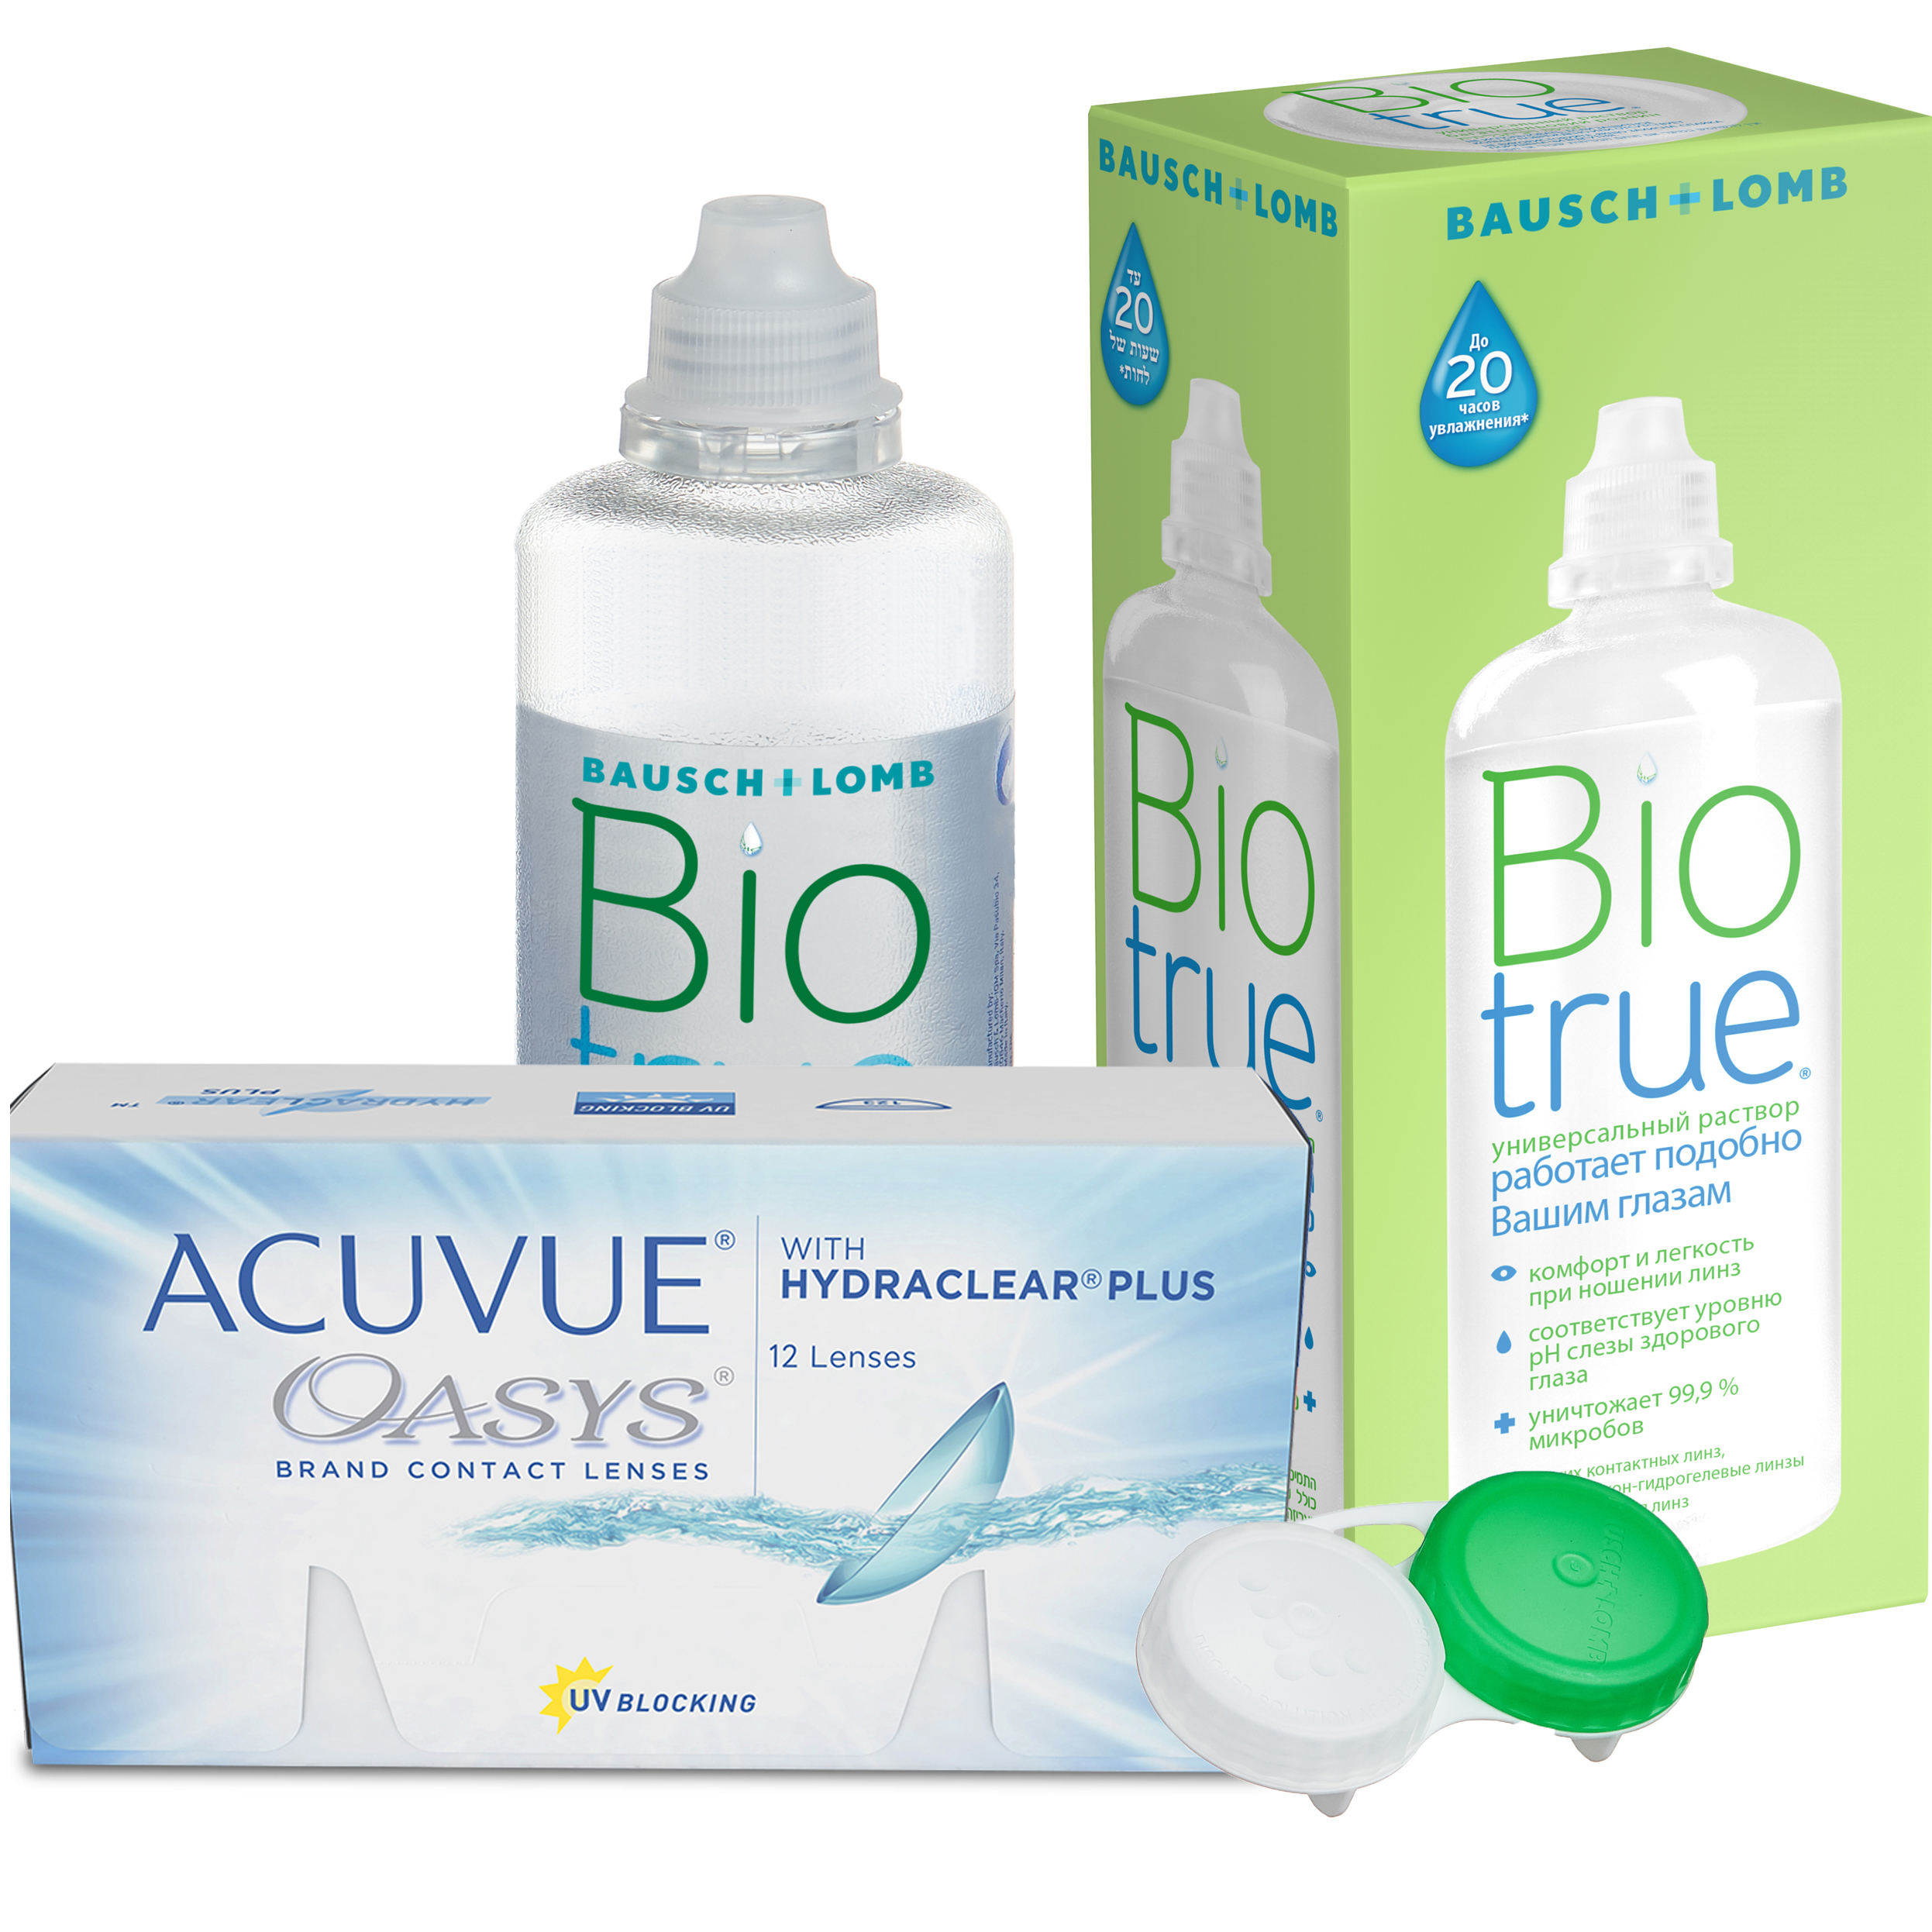 Купить Oasys with Hydraclear Plus 12 линз + Biotrue, Контактные линзы Acuvue Oasys with Hydraclear Plus 12 линз R 8.4 -1, 50 + Biotrue 300 мл